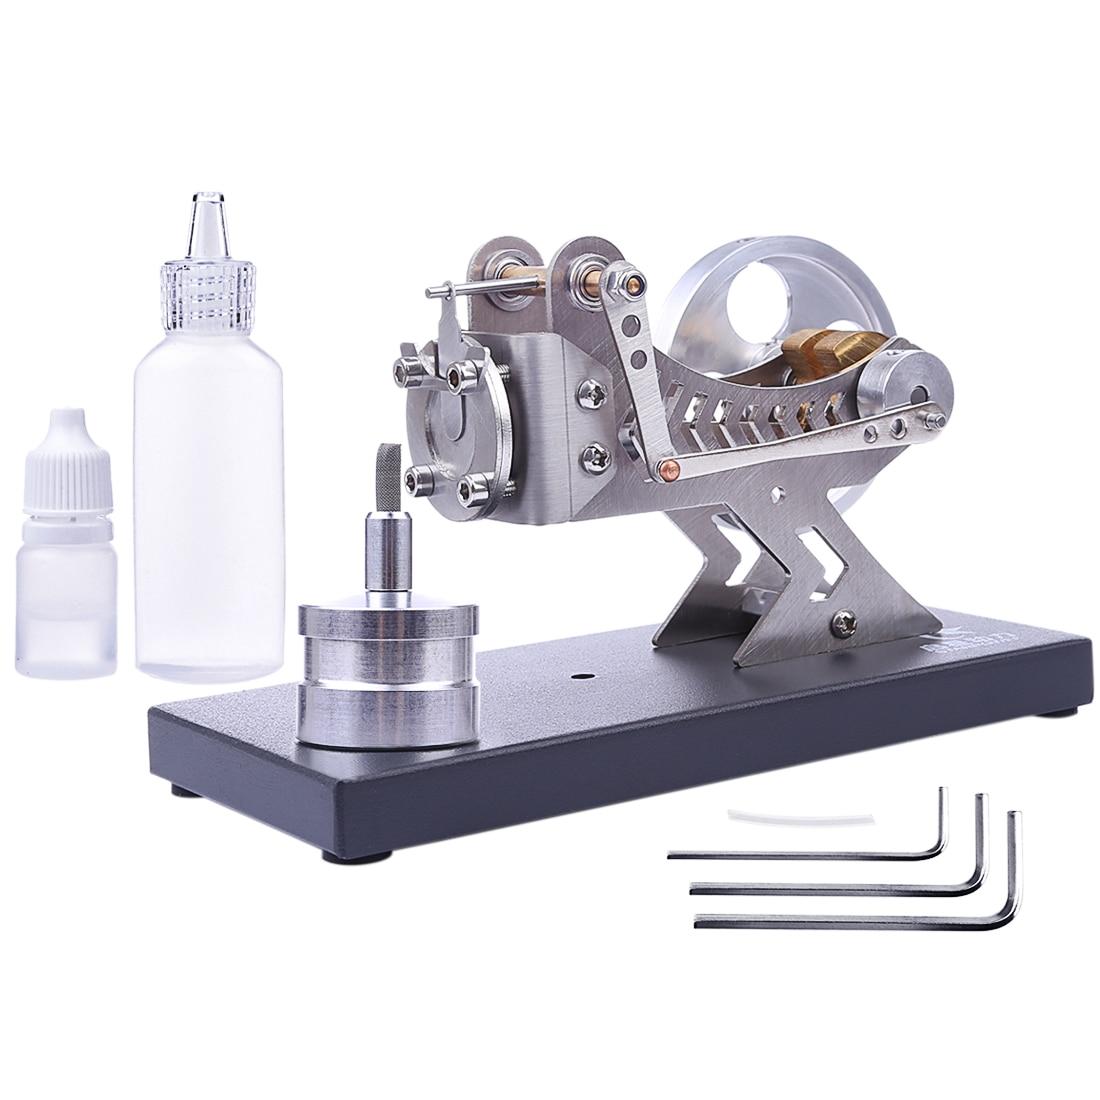 US $74 21 42% OFF|Hot All Metal Vacuum Stirling Engine Model DIY Hot Gas  Turbine Stem Steam Model Set Educational Toy Gift For Kid Children Adult-in